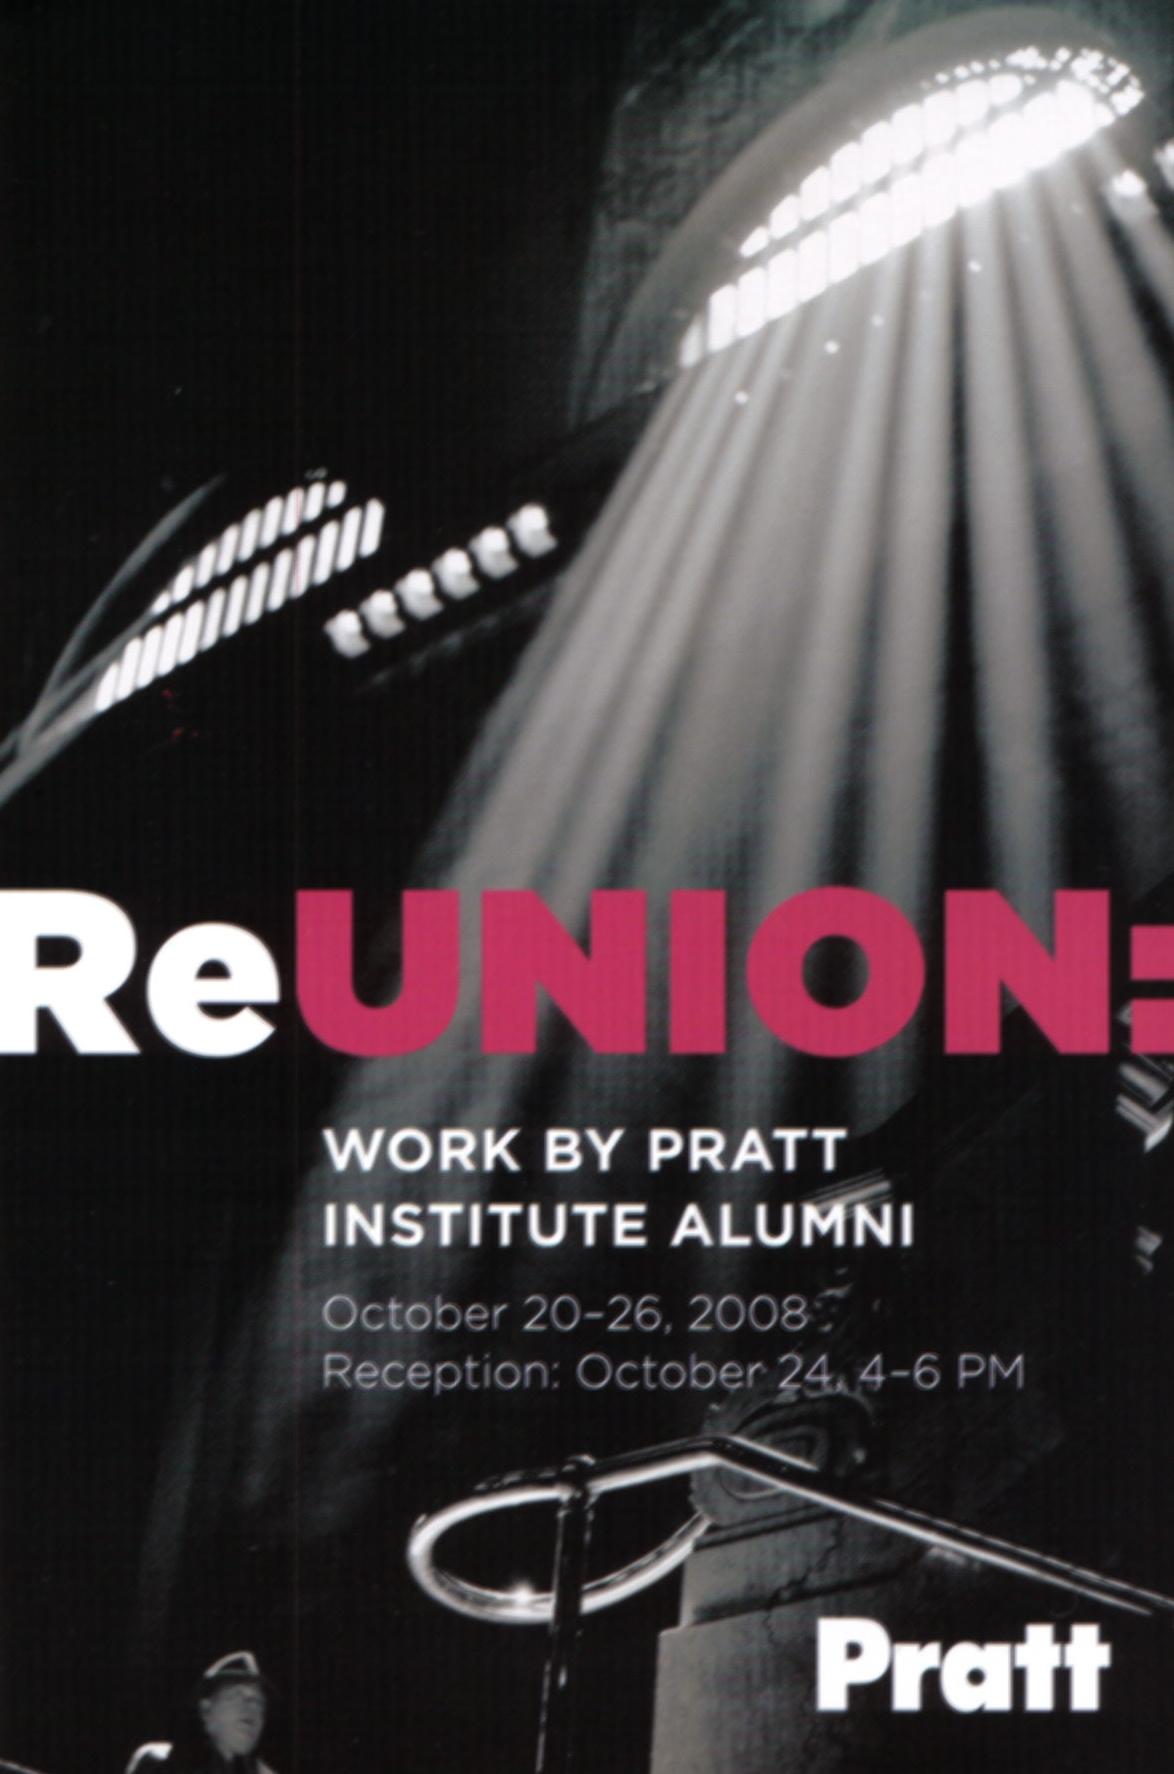 ReUnion_Pratt_Exhibit_Oct_2008.jpg